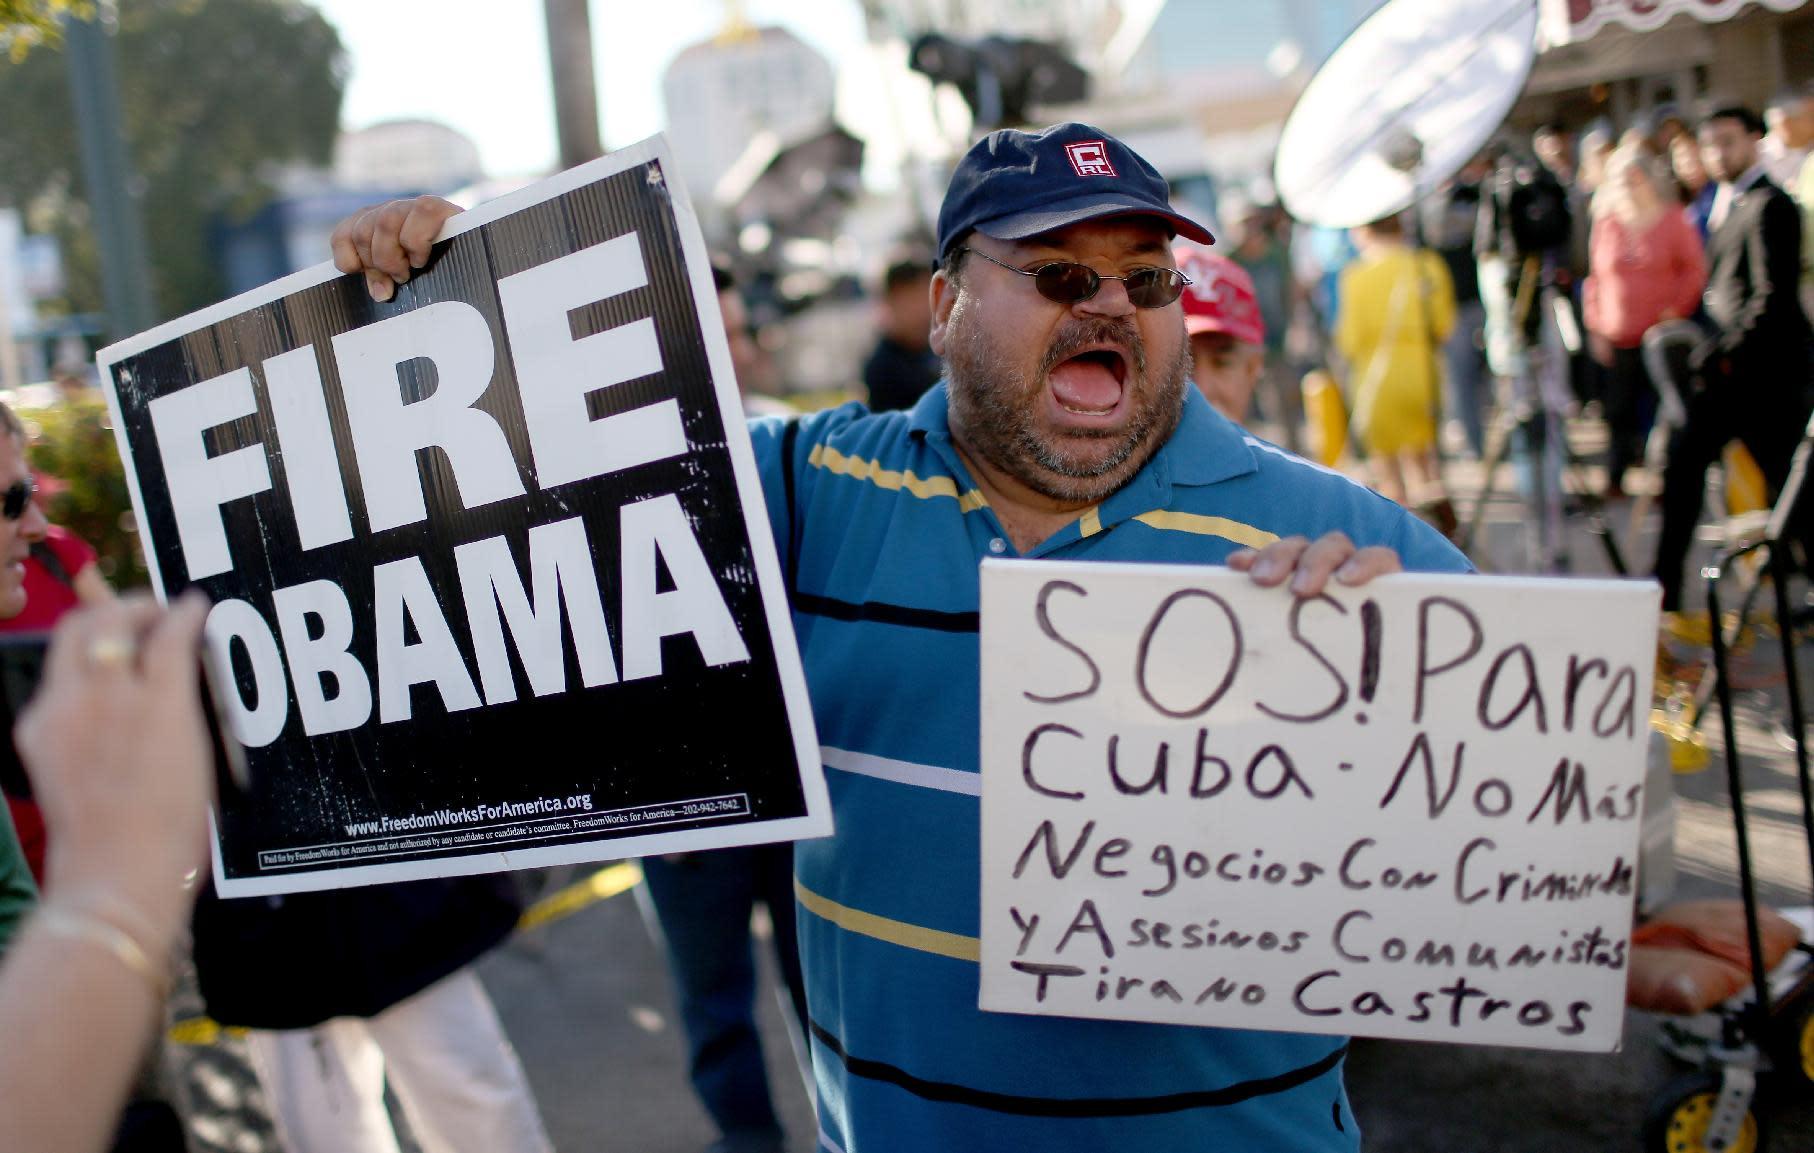 Cubans in Miami slam 'betrayal' after historic move